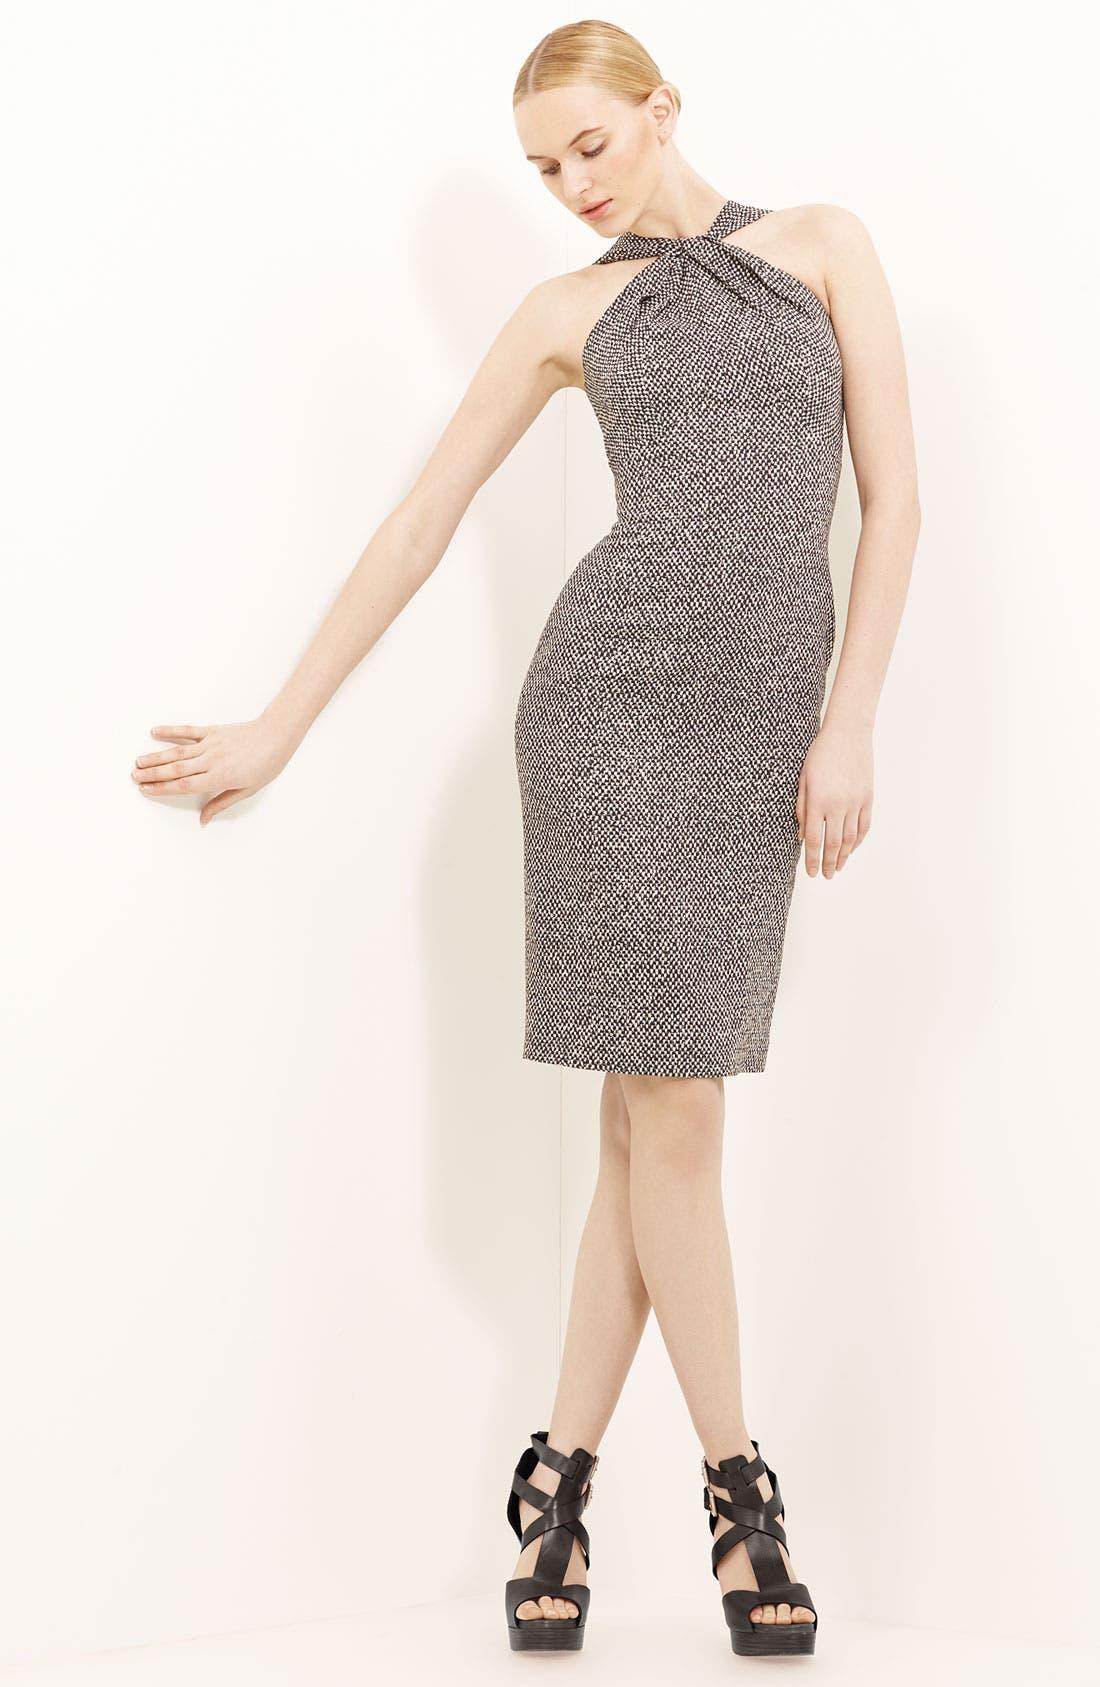 Main Image - Michael Kors Tweed Print Cady Dress